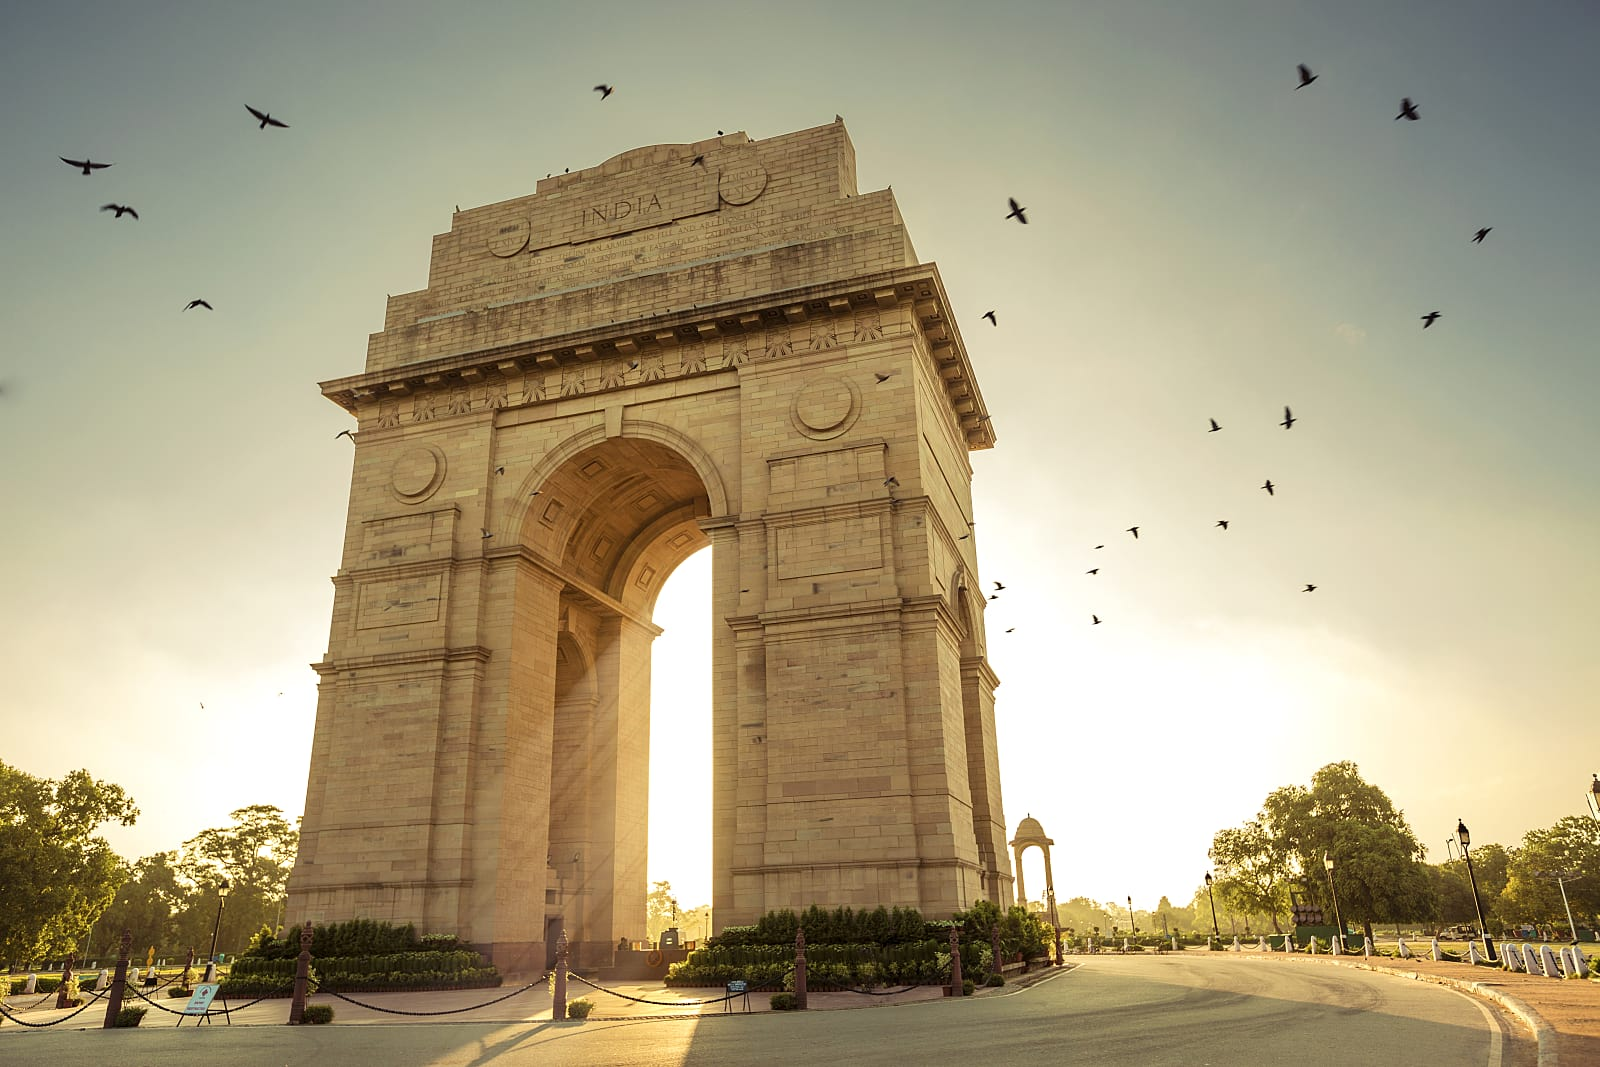 PunjabKesari, दिल्ली इमेज, delhi image